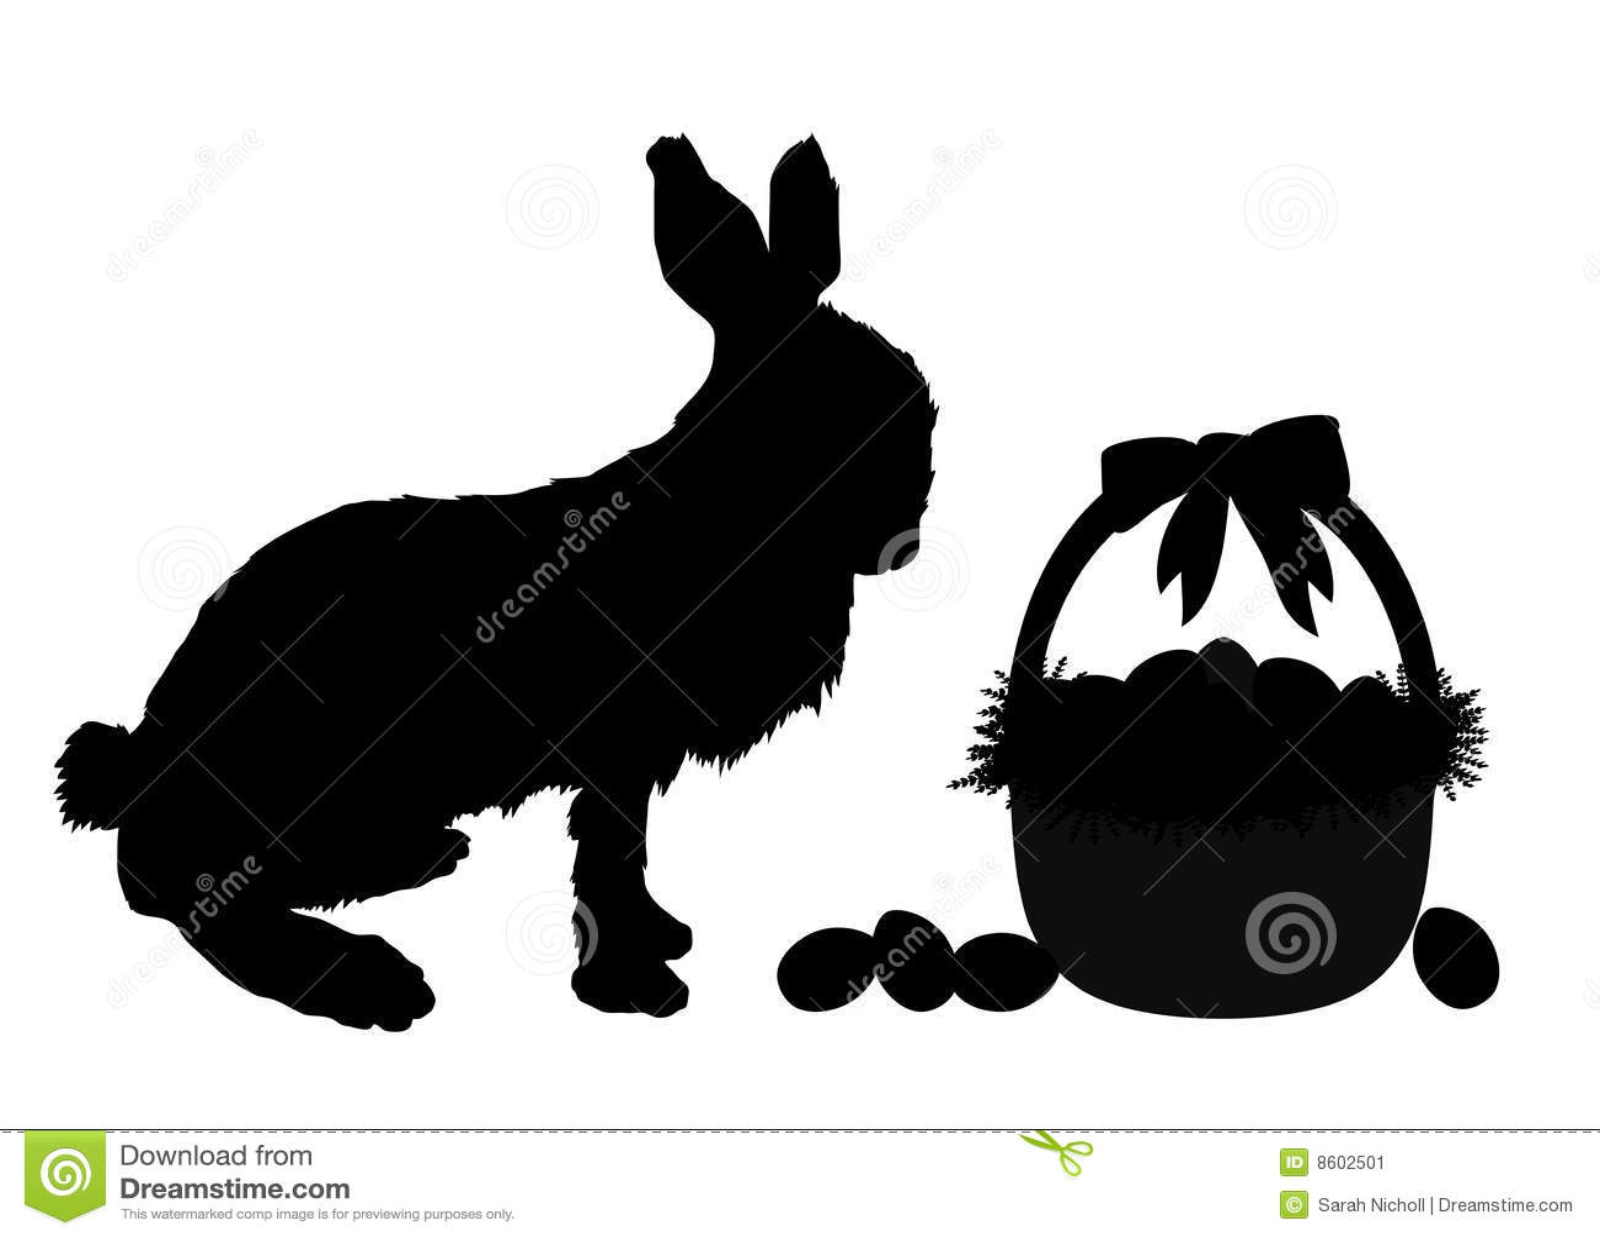 Rabbit Ears Silhouette Easter Bunny Stock Image